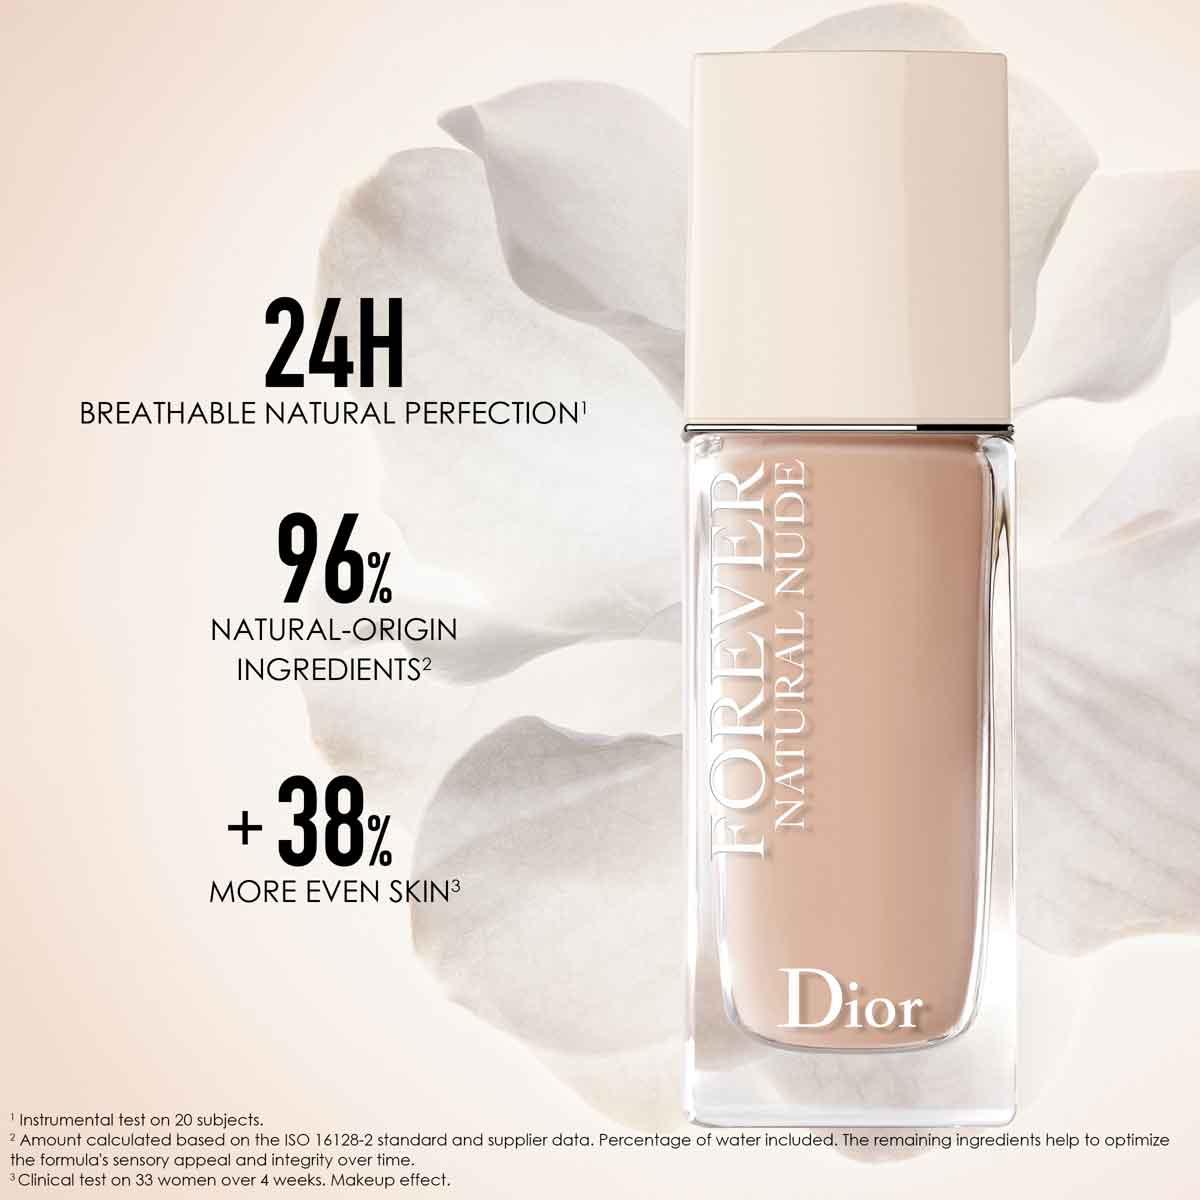 Dior Diorskin Nude Skin-Glowing Foundation Broad Spectrum